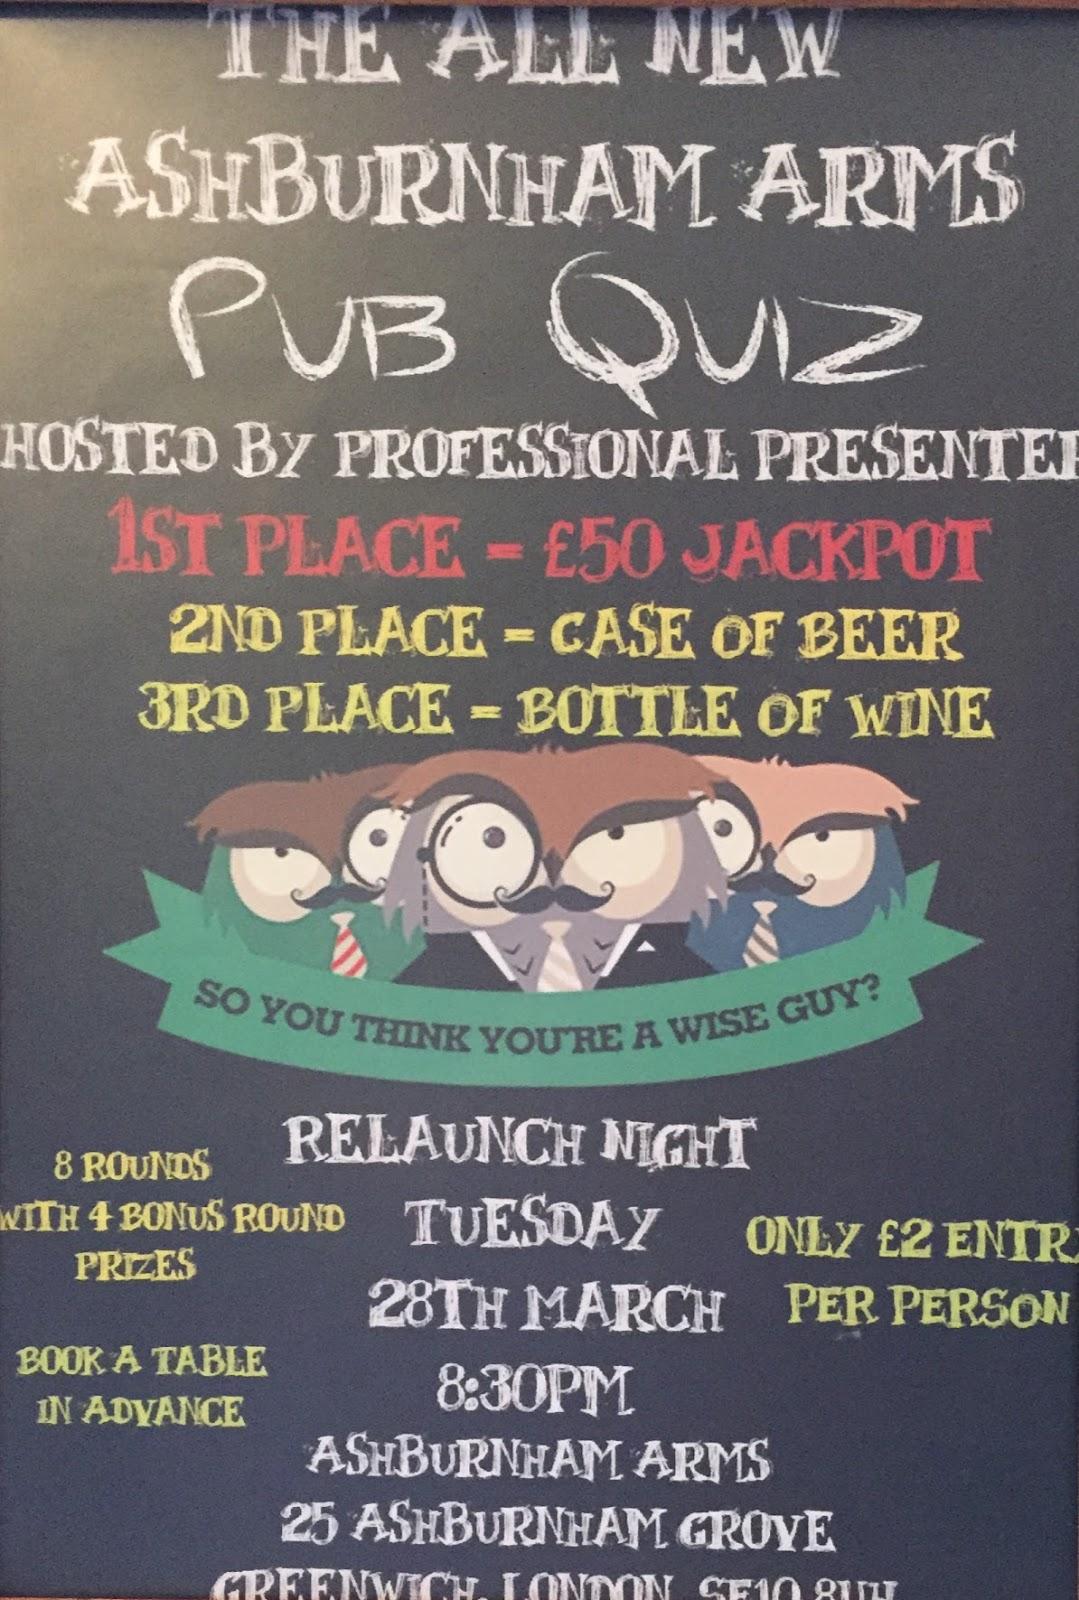 Ashburnham Triangle Association: New Pub Quiz at the